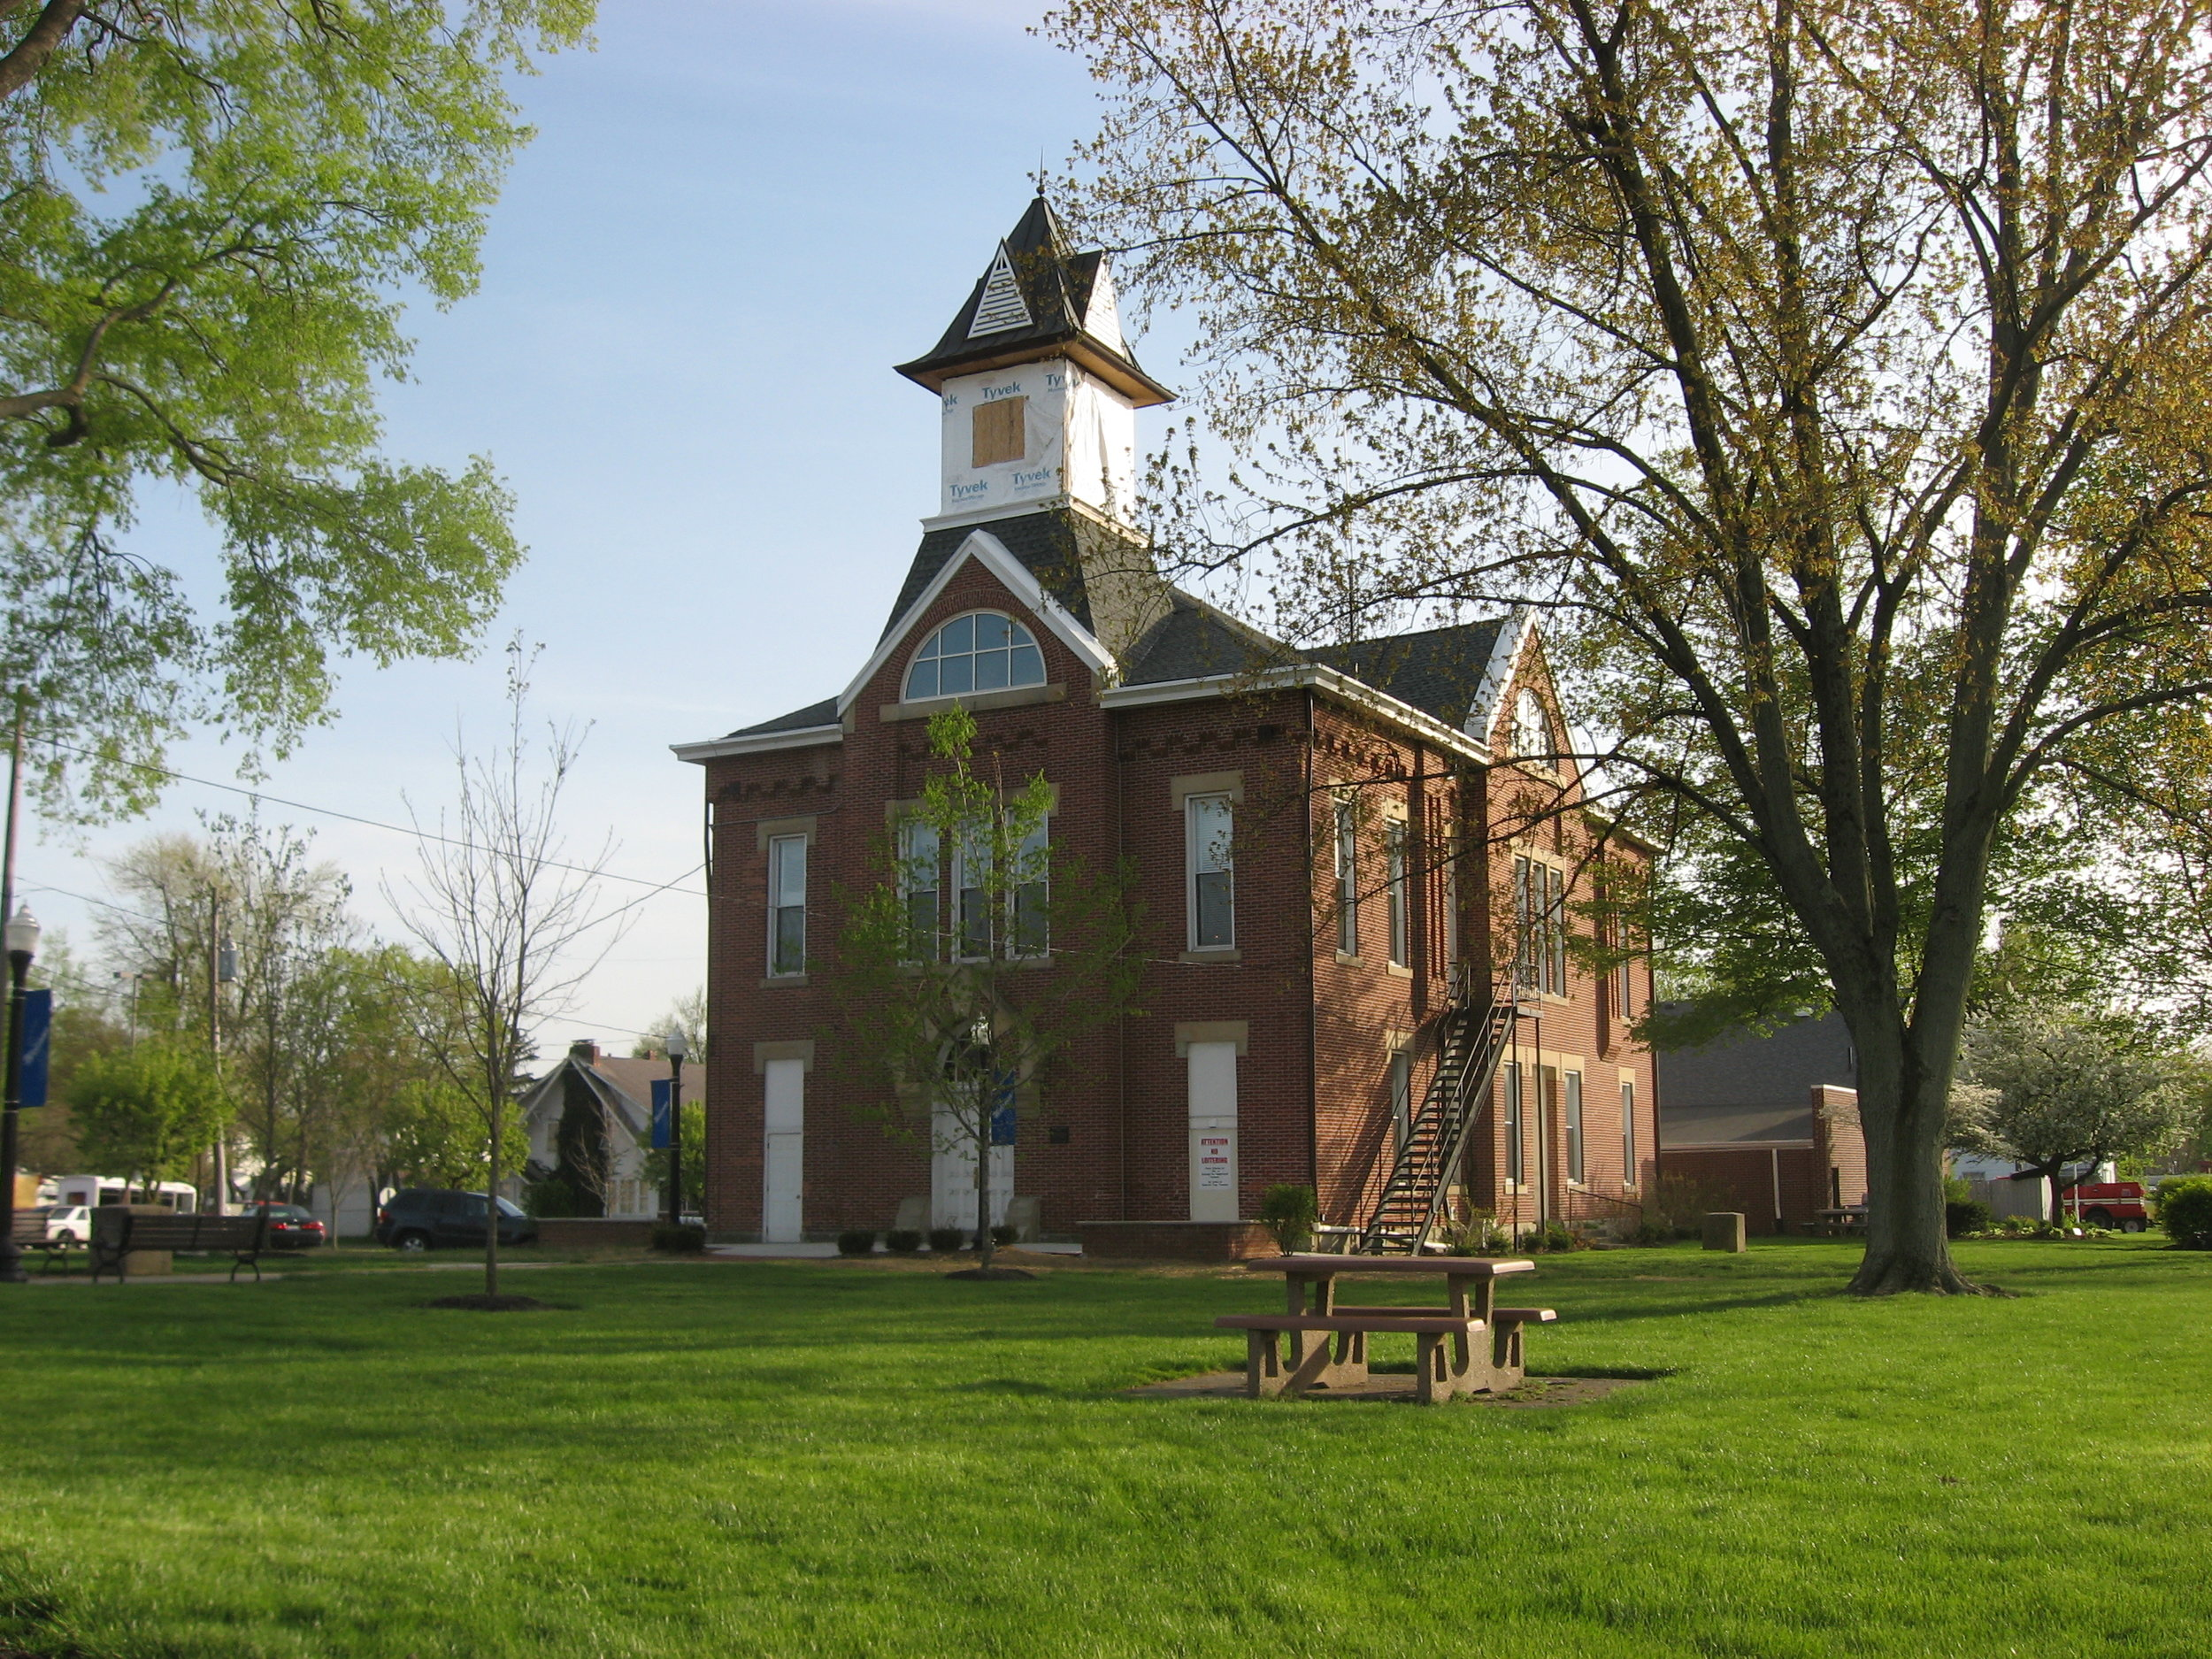 Monroe_Township_Hall-Opera_House.jpg